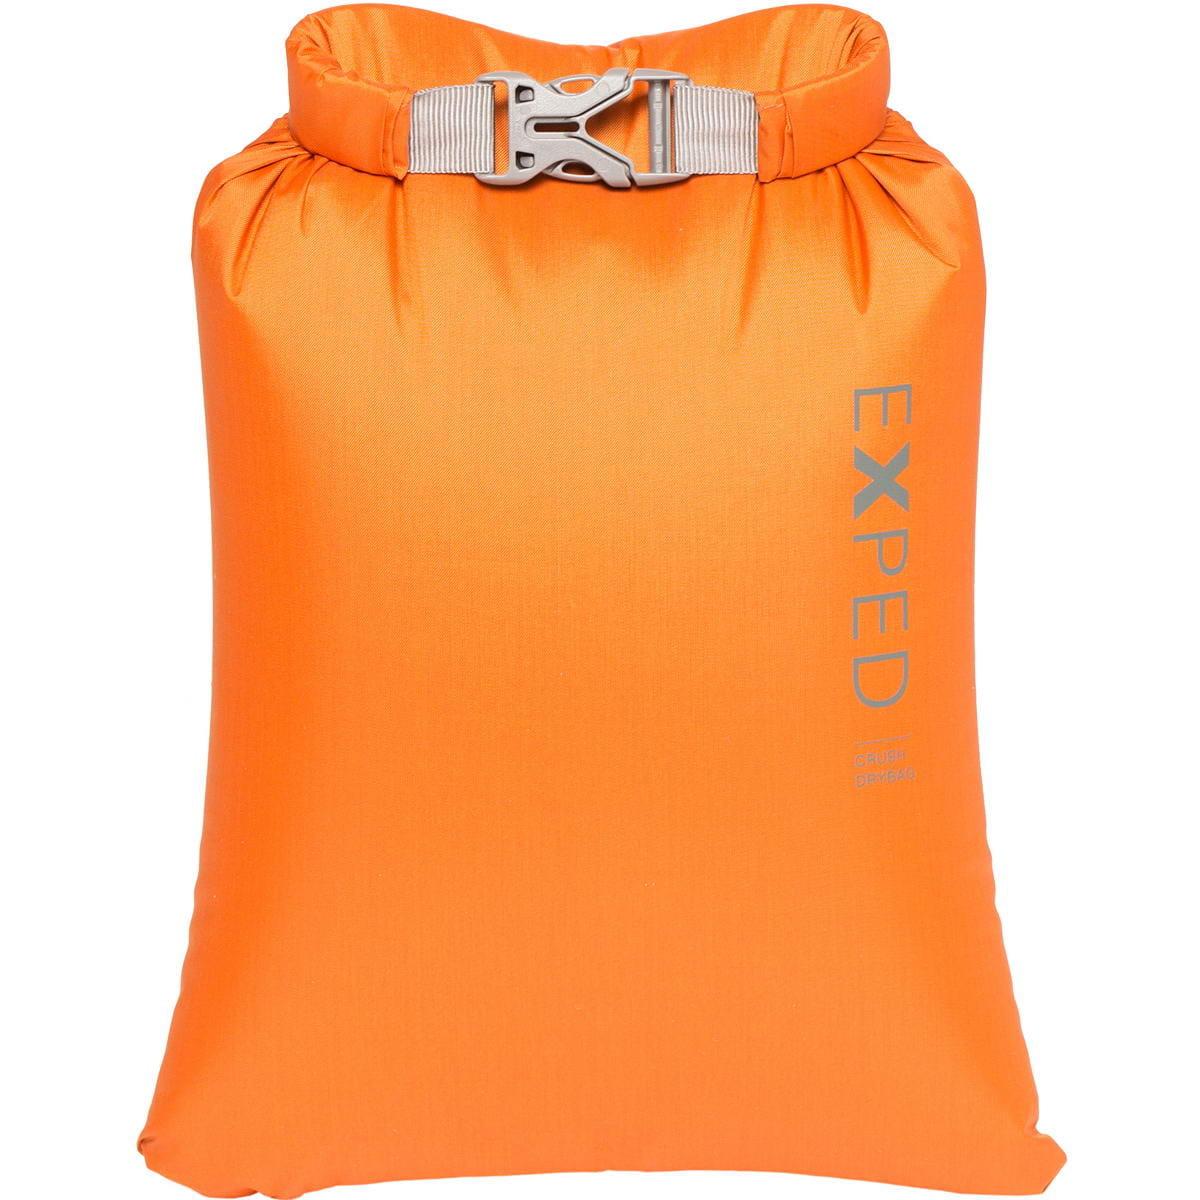 EXPED Crush Drybag XS 2-dimensional - gepolsterter Packsack - Bild 1